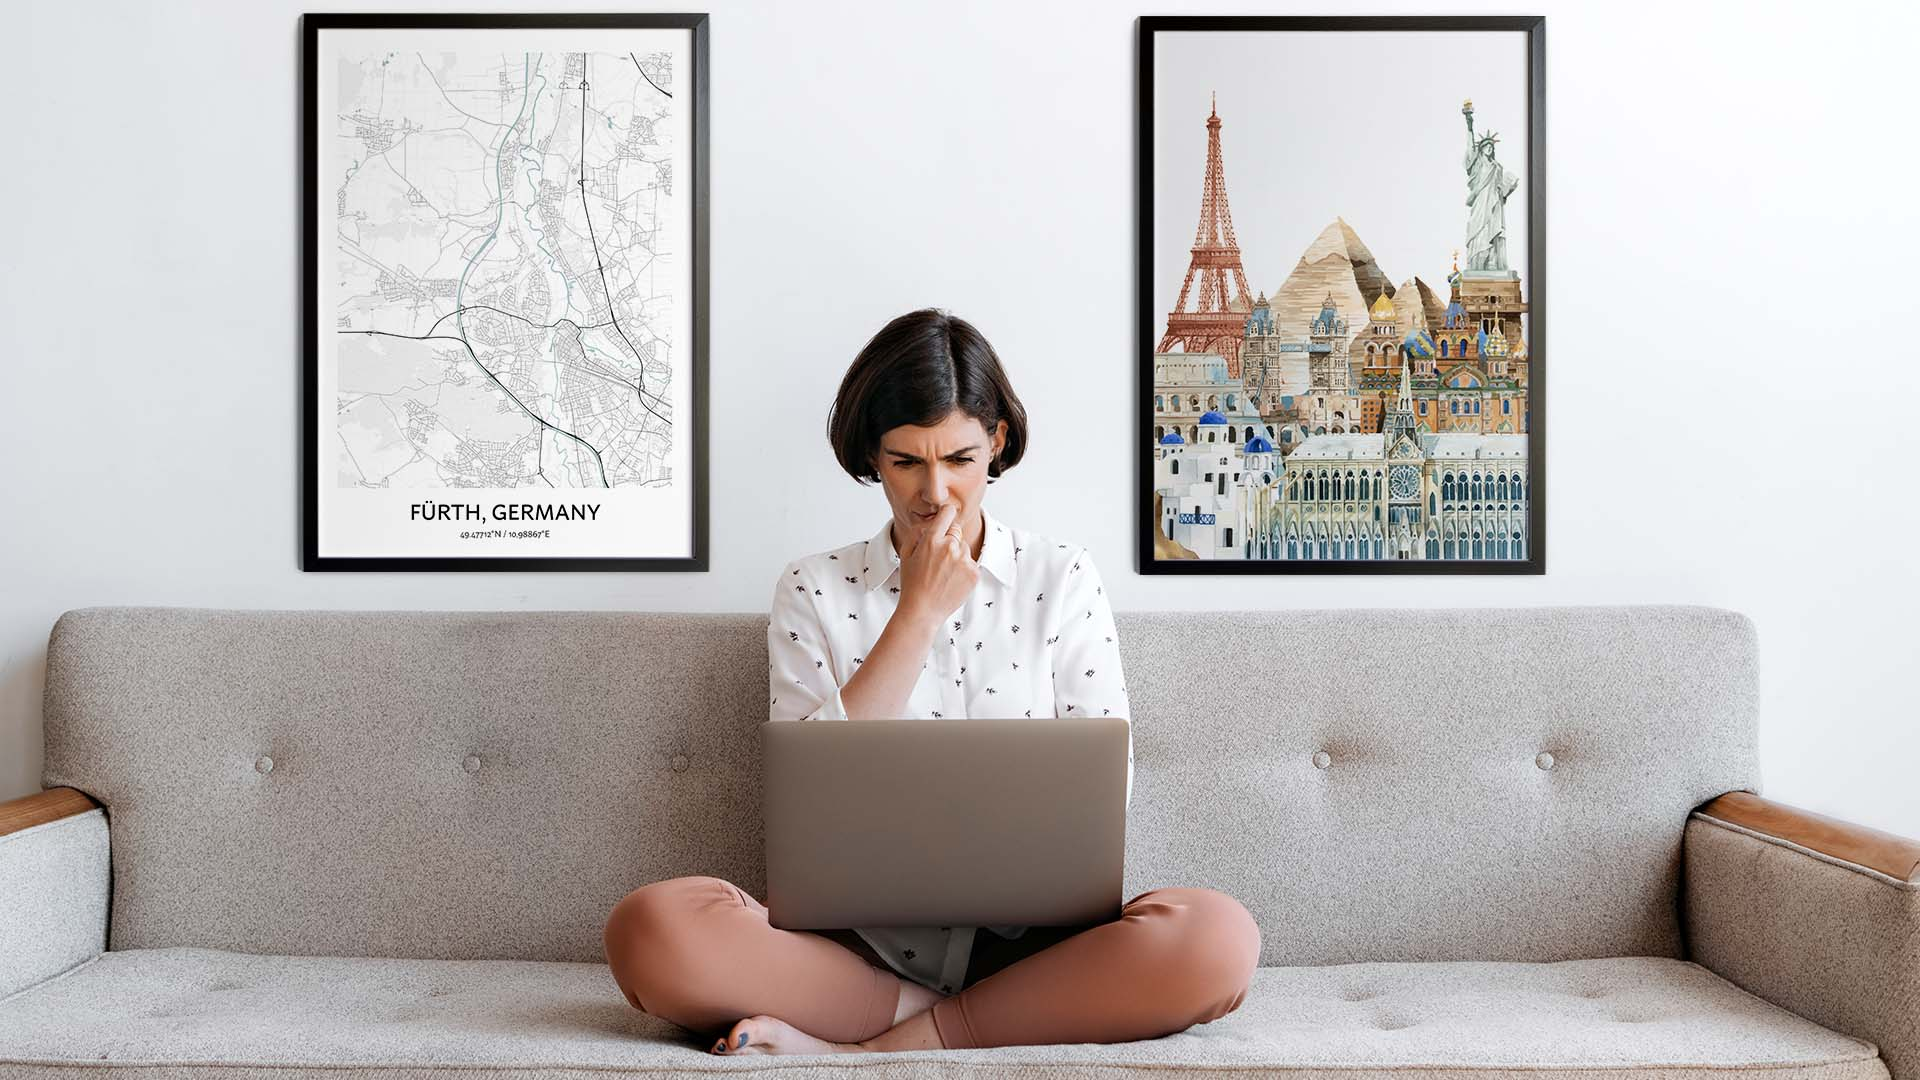 Furth city map art